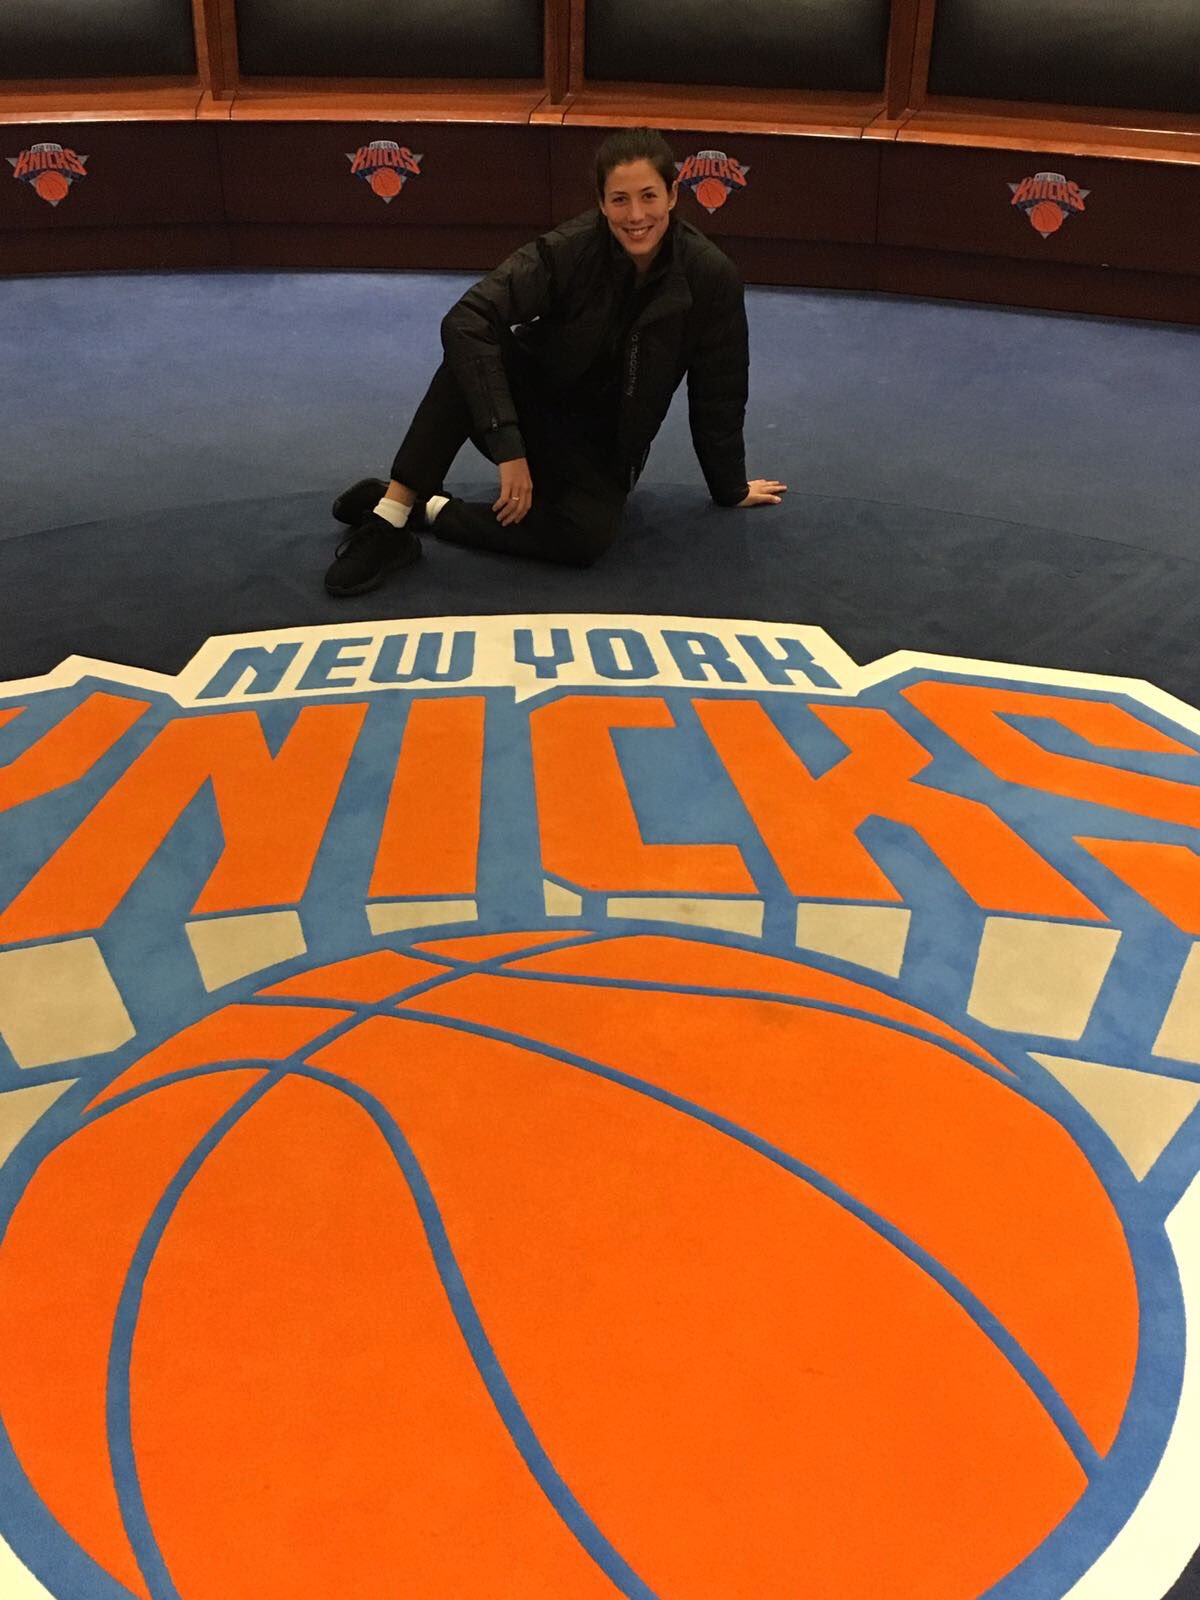 �� ⛹️ @nyknicks hanging in your locker!   ��En el vestuario de los @nyknicks   @NBA @TheGarden #WorldTennisDay https://t.co/OyQu3RFKlC